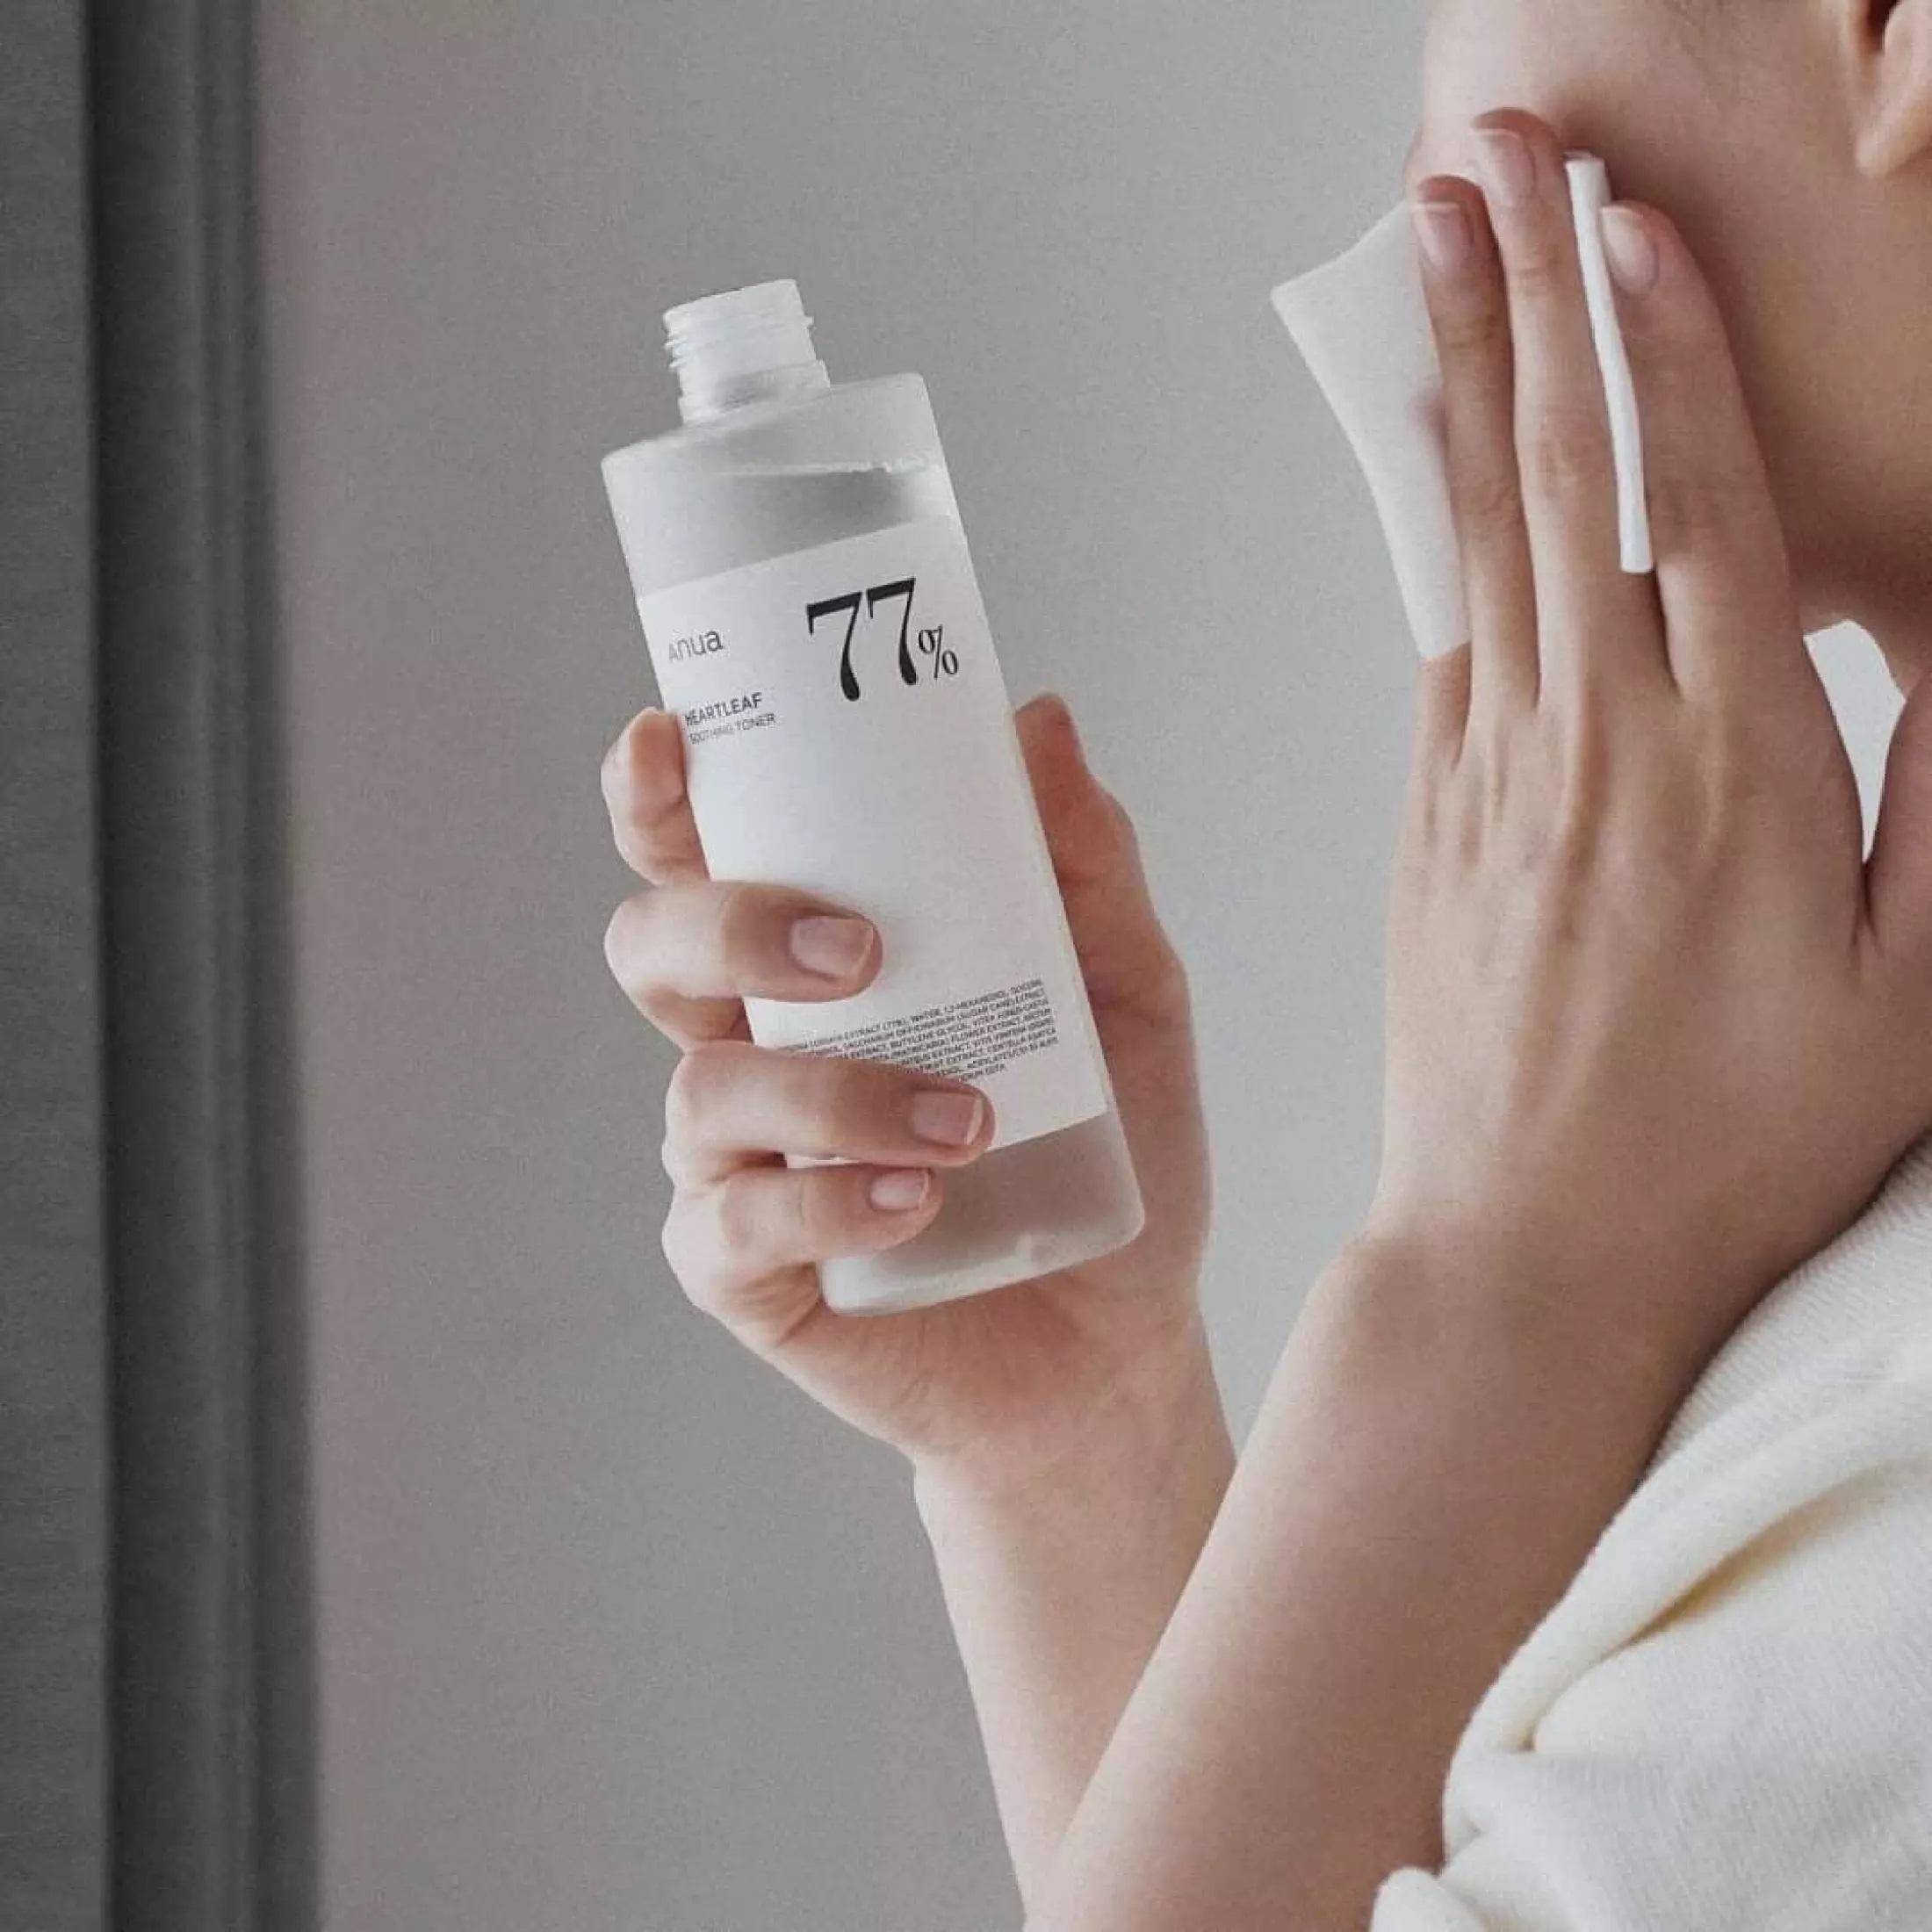 ANUA Heartleaf 77% Soothing Toner 250ml (โทนเนอร์พี่จุน)